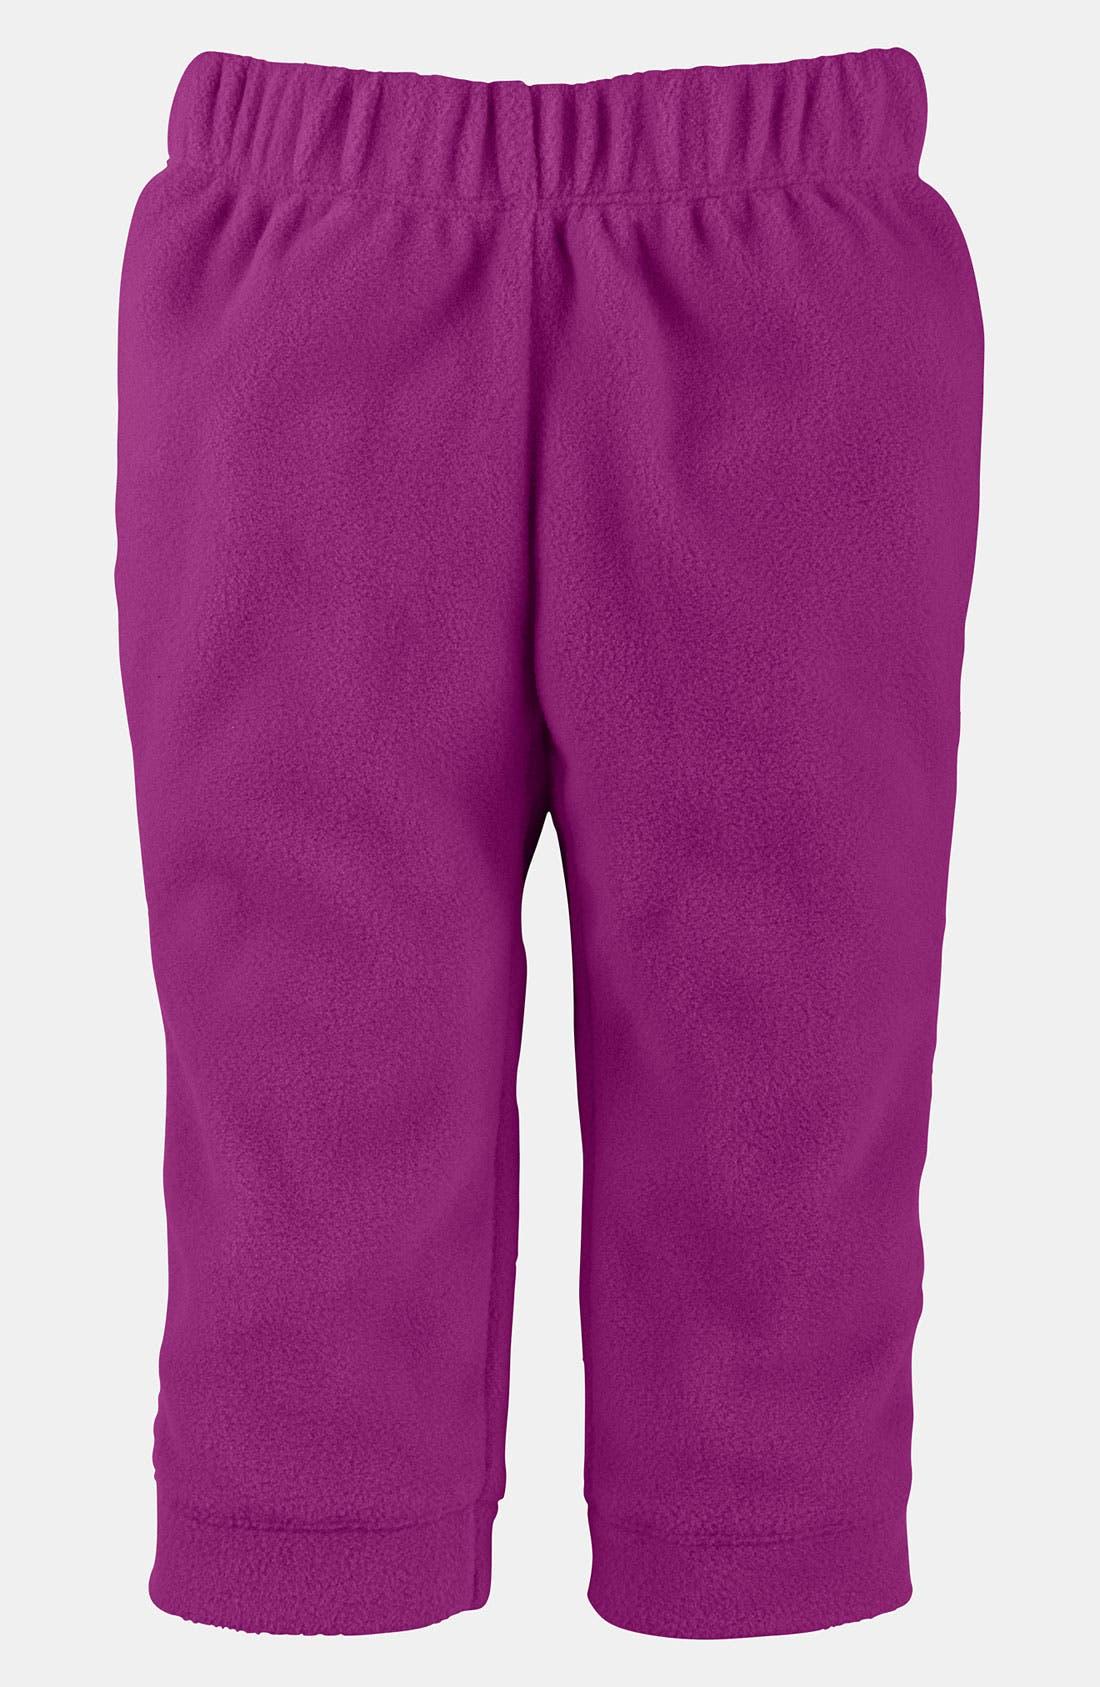 Main Image - The North Face 'Glacier' Pants (Baby)